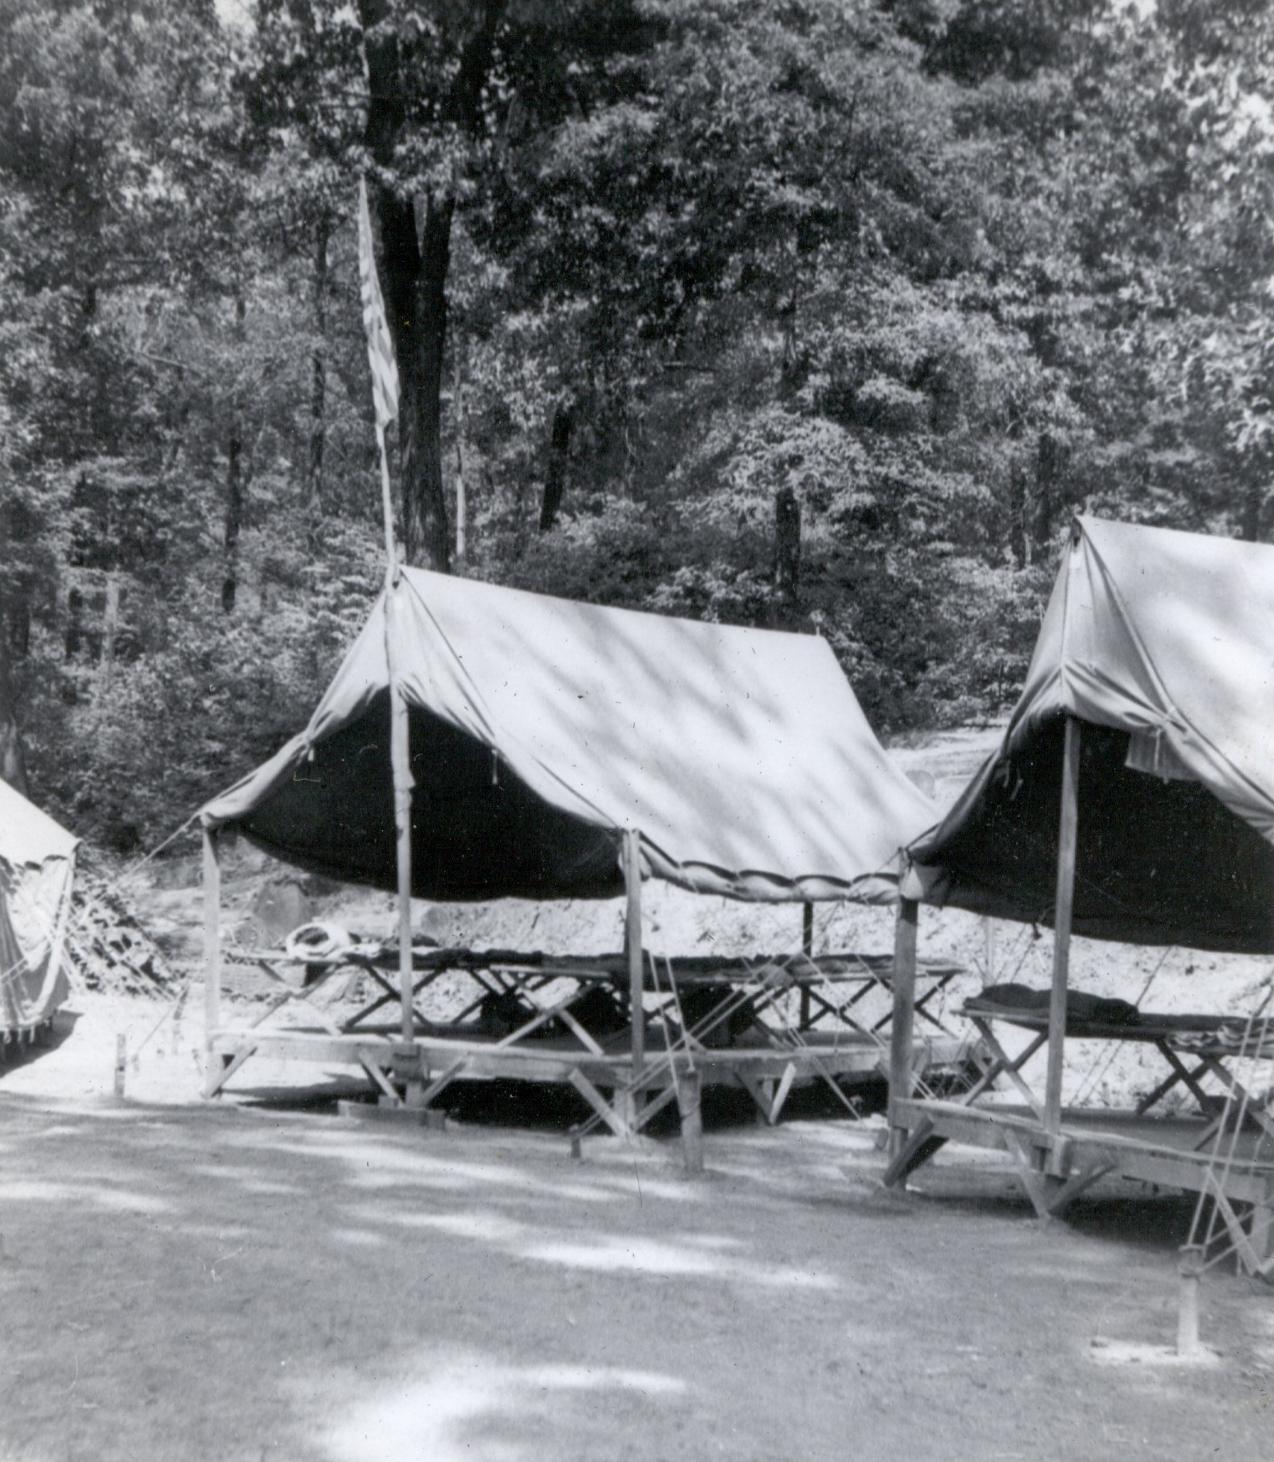 Delaware campsite in 1948